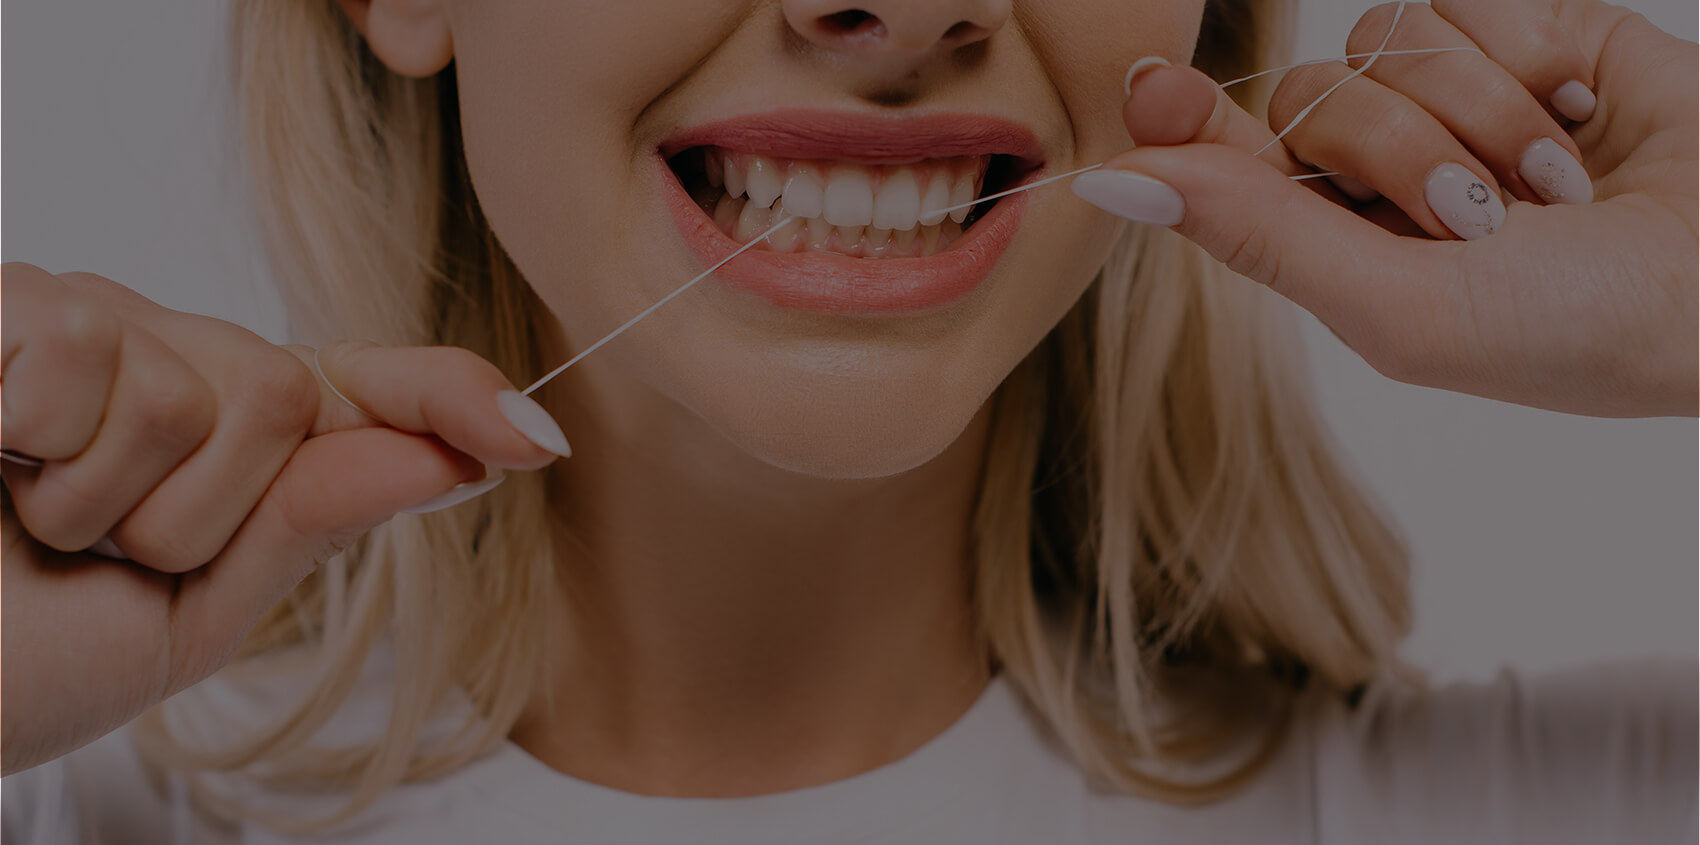 Dental Hygiene Tips for Patients in the Salt Lake City, Utah